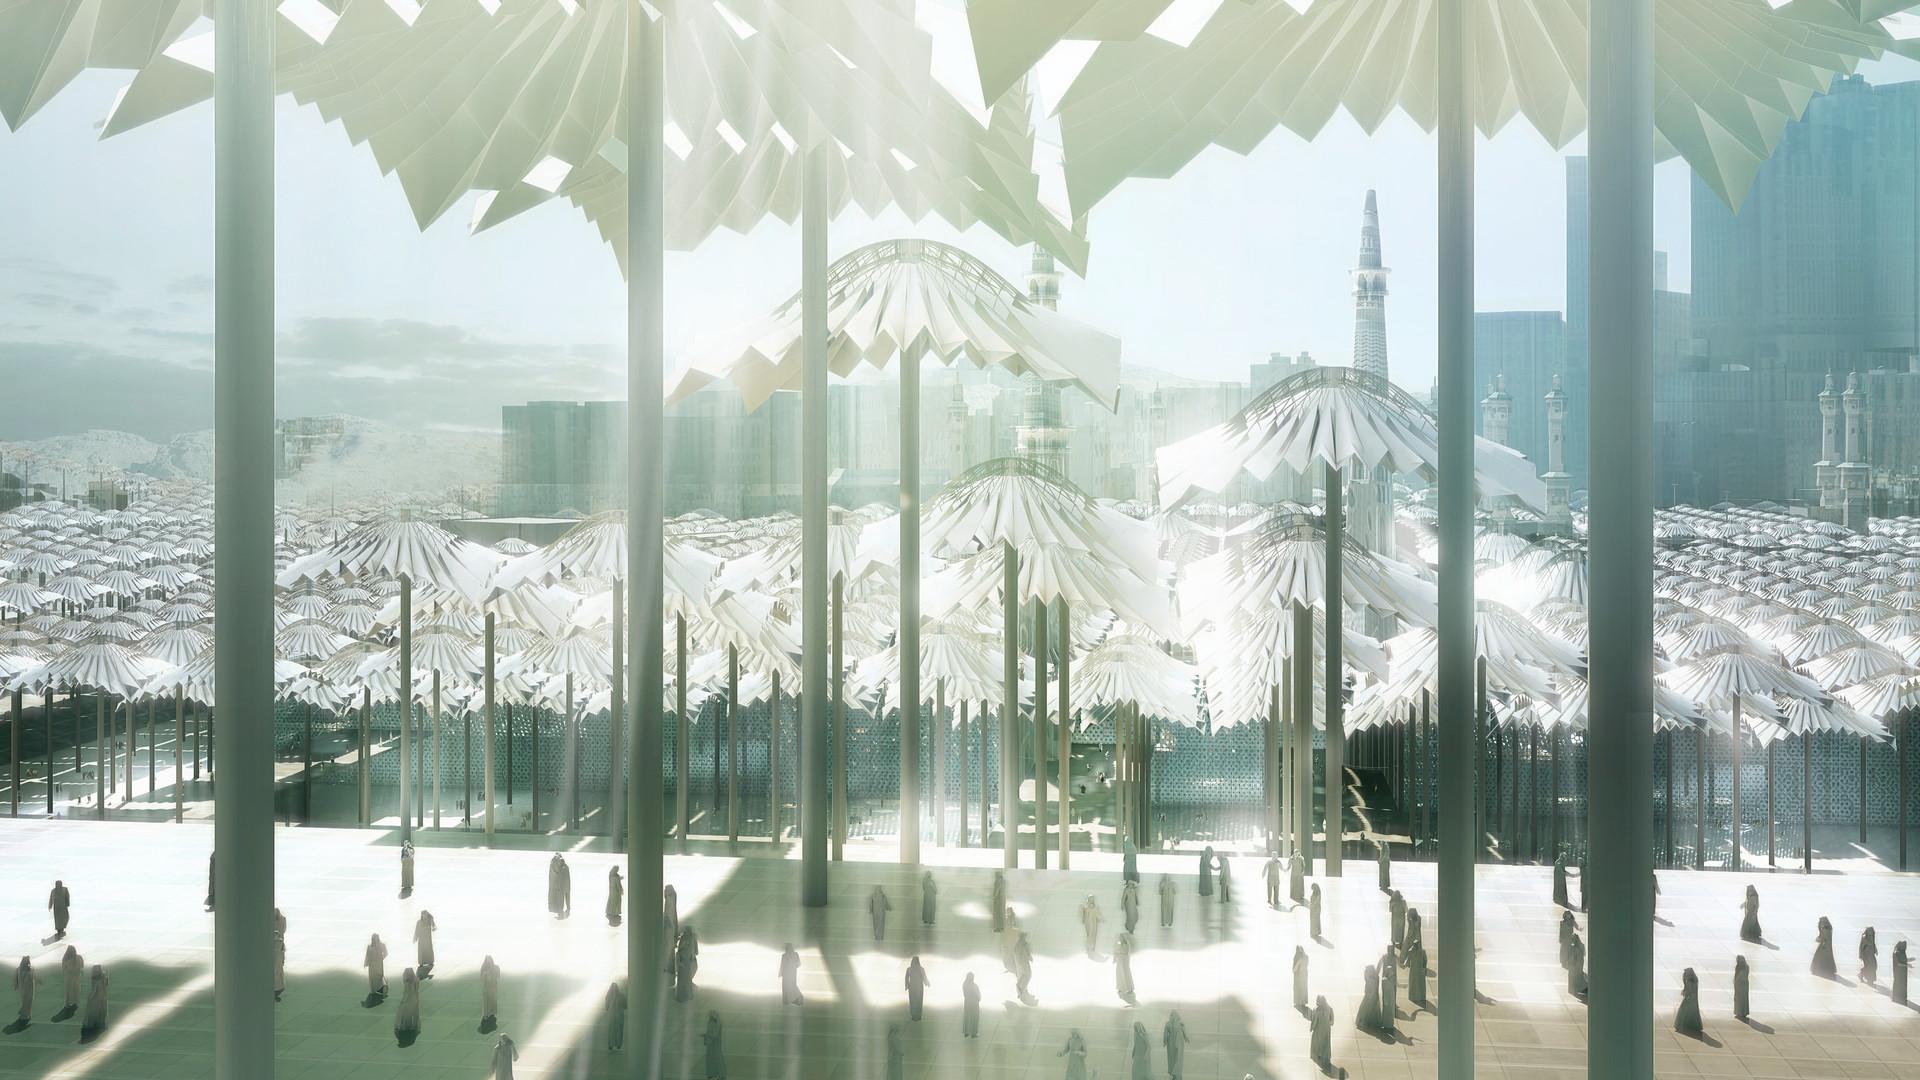 Ben Dieckmann architects Mecca Al Haram Mosque